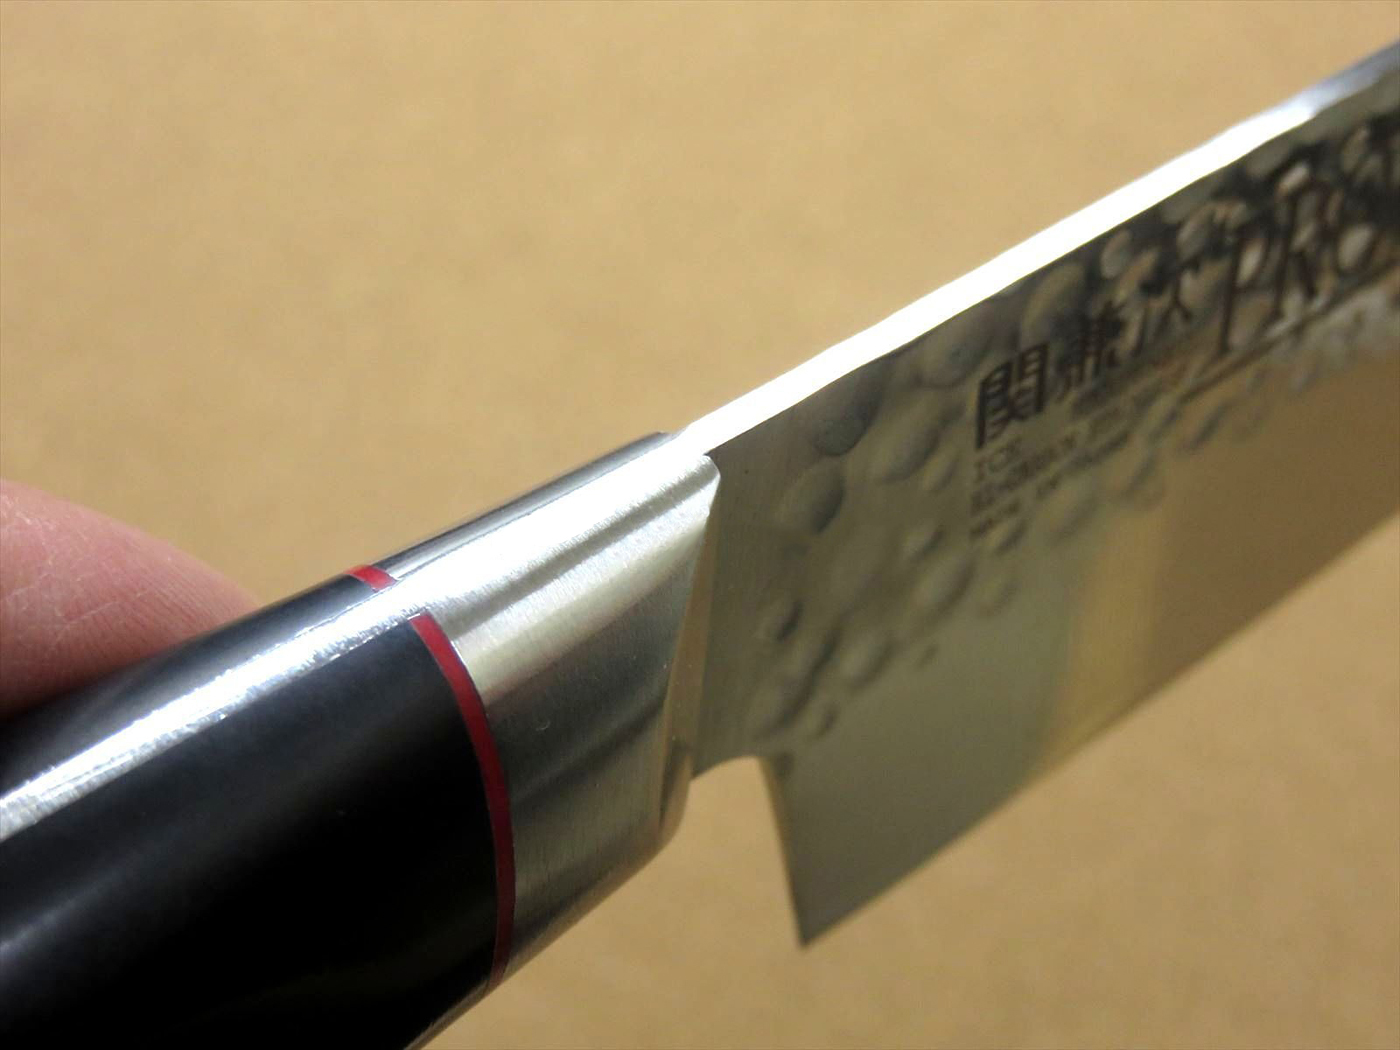 Фото 8 - Кухонный нож Сантоку, Pro-J, Kanetsugu, 6003, сталь VG-10, в картонной коробке